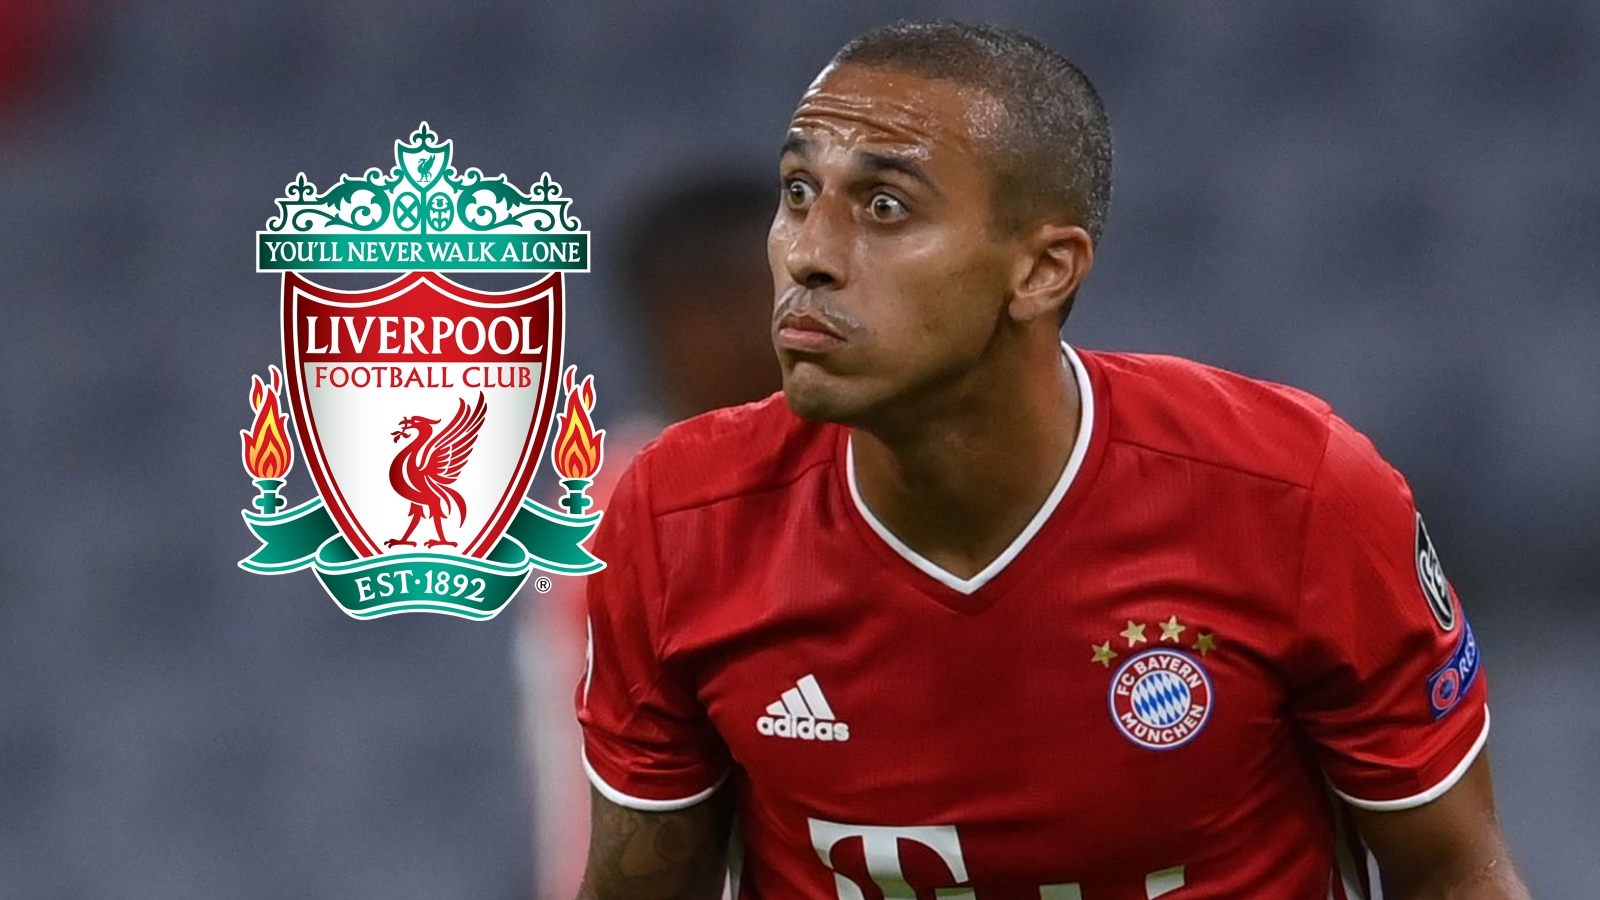 Thiago Alcantara Sempurna Graeme Souness Gereget Liverpool Pasif Di Bursa Transfer Goal Com